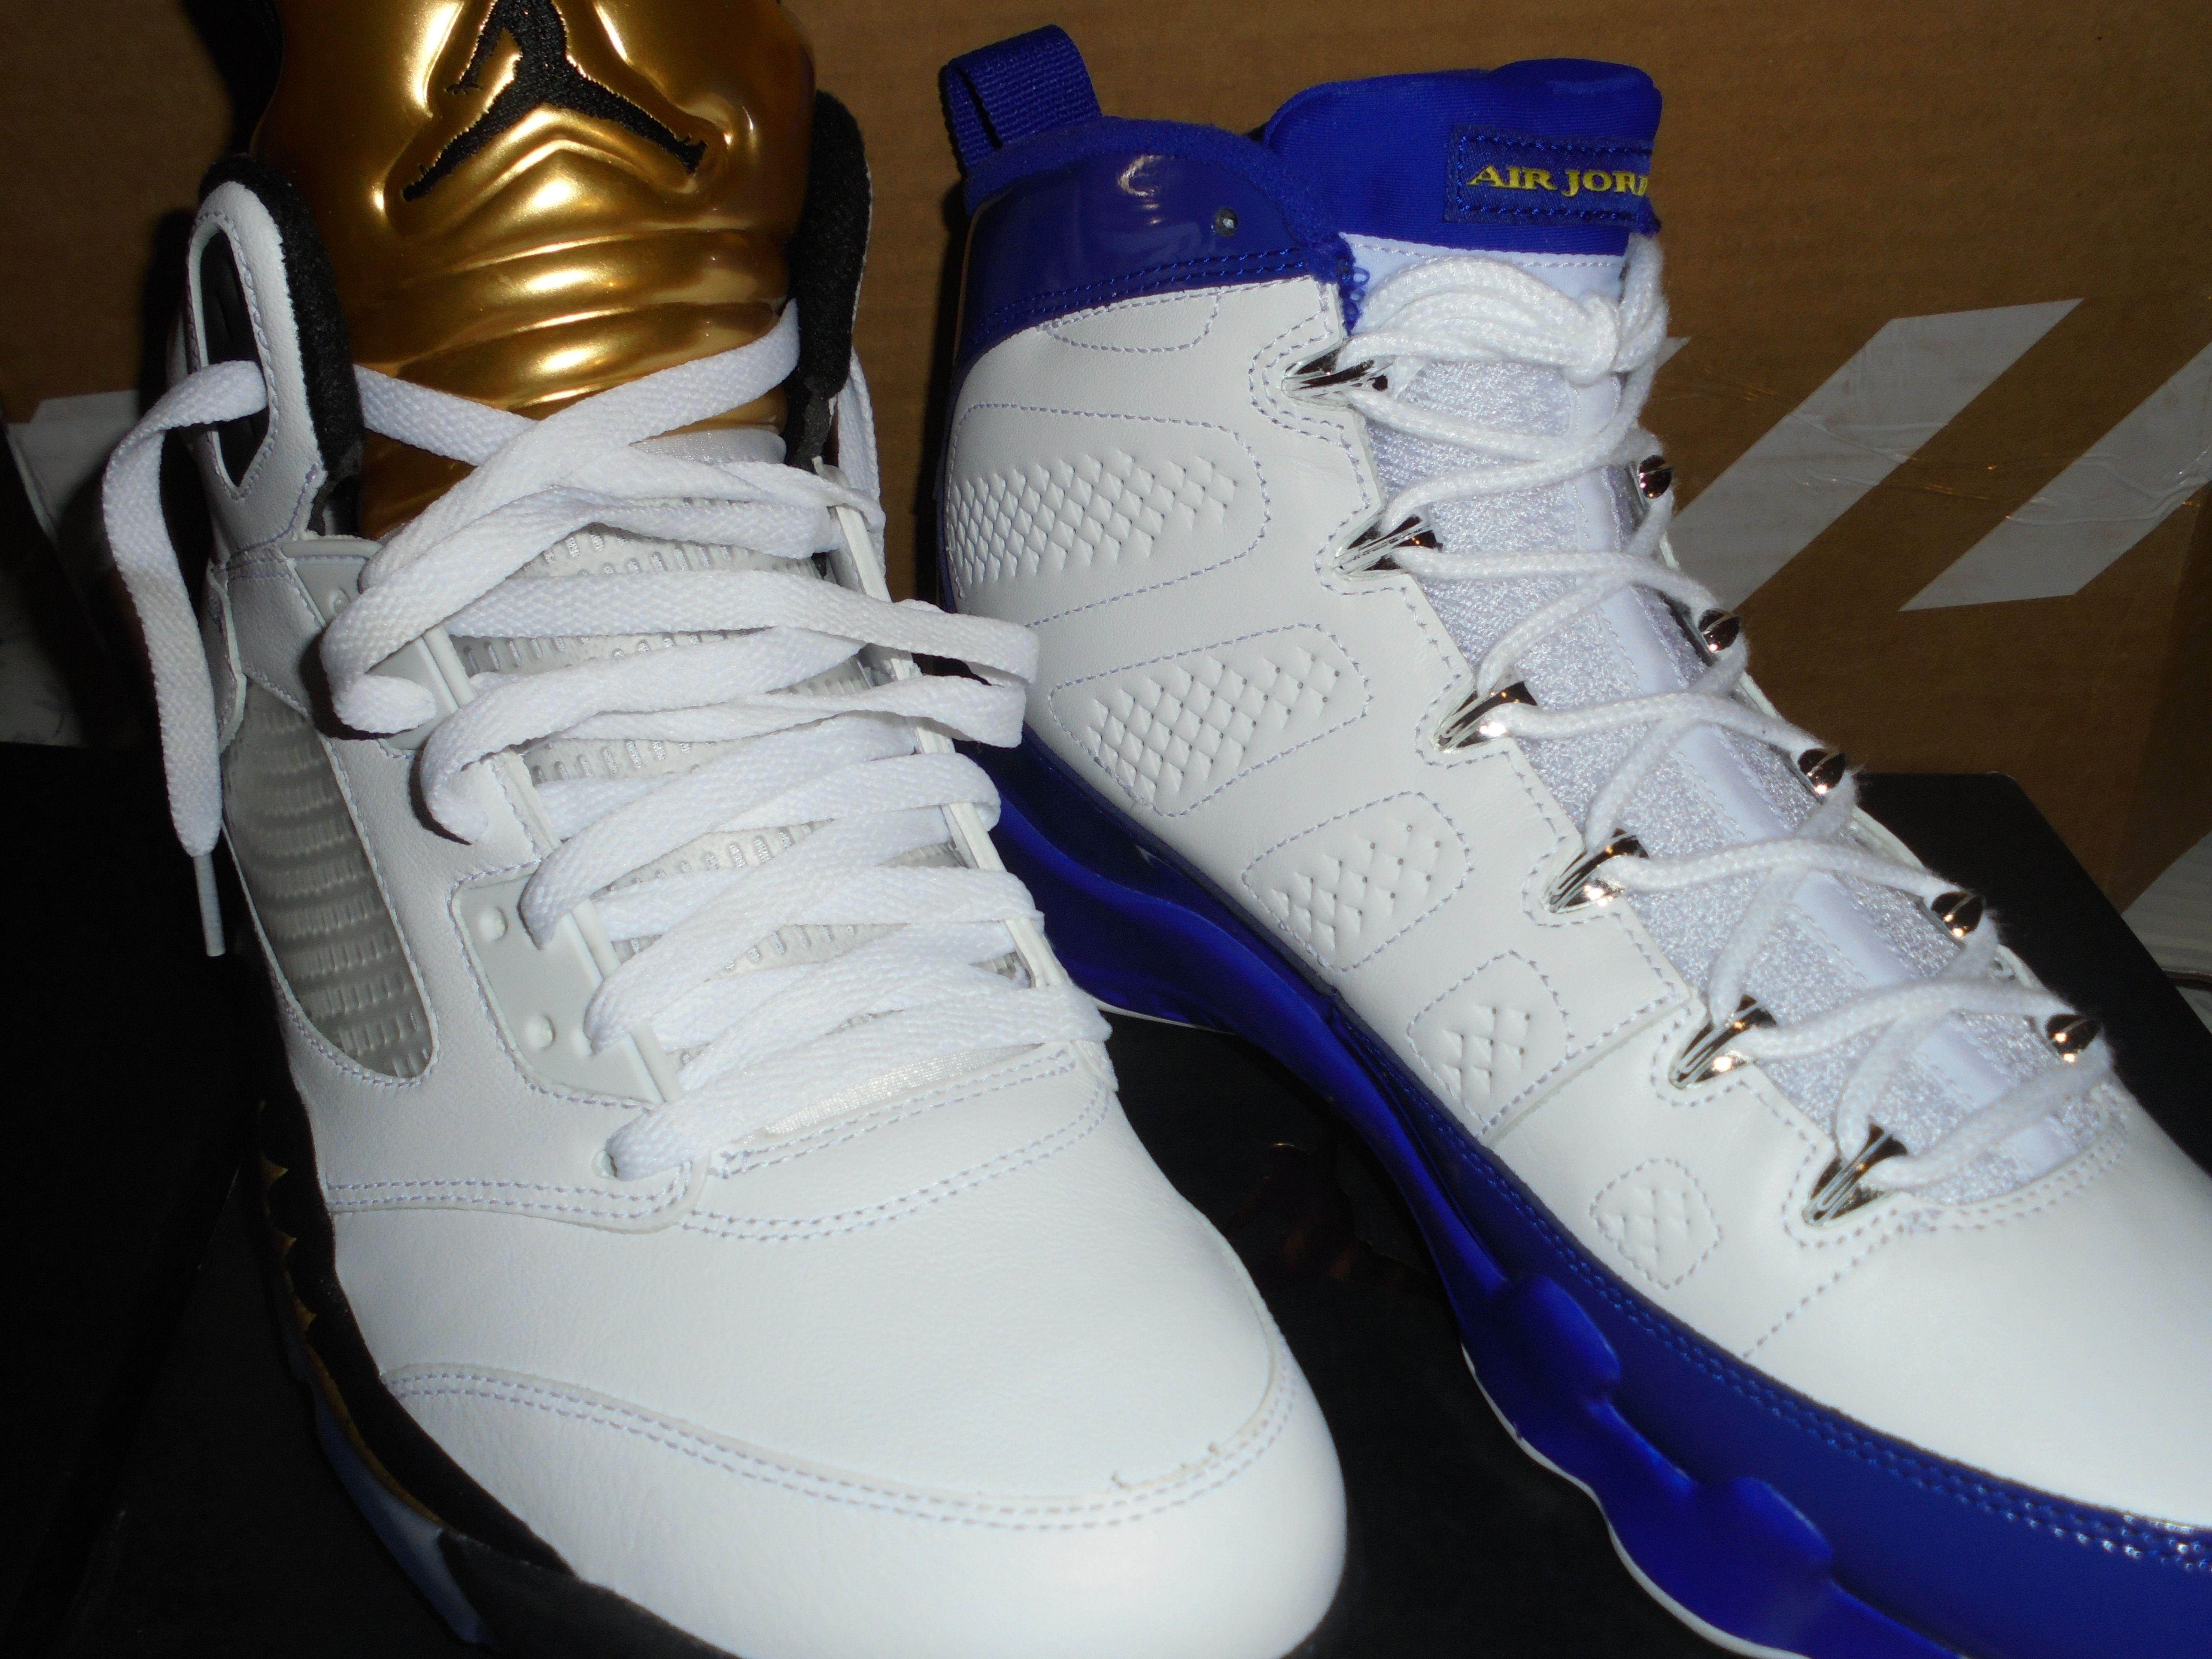 #Jordan9 and #Jordan5 #sneakers - http://www.drewrynewsnetwork.com